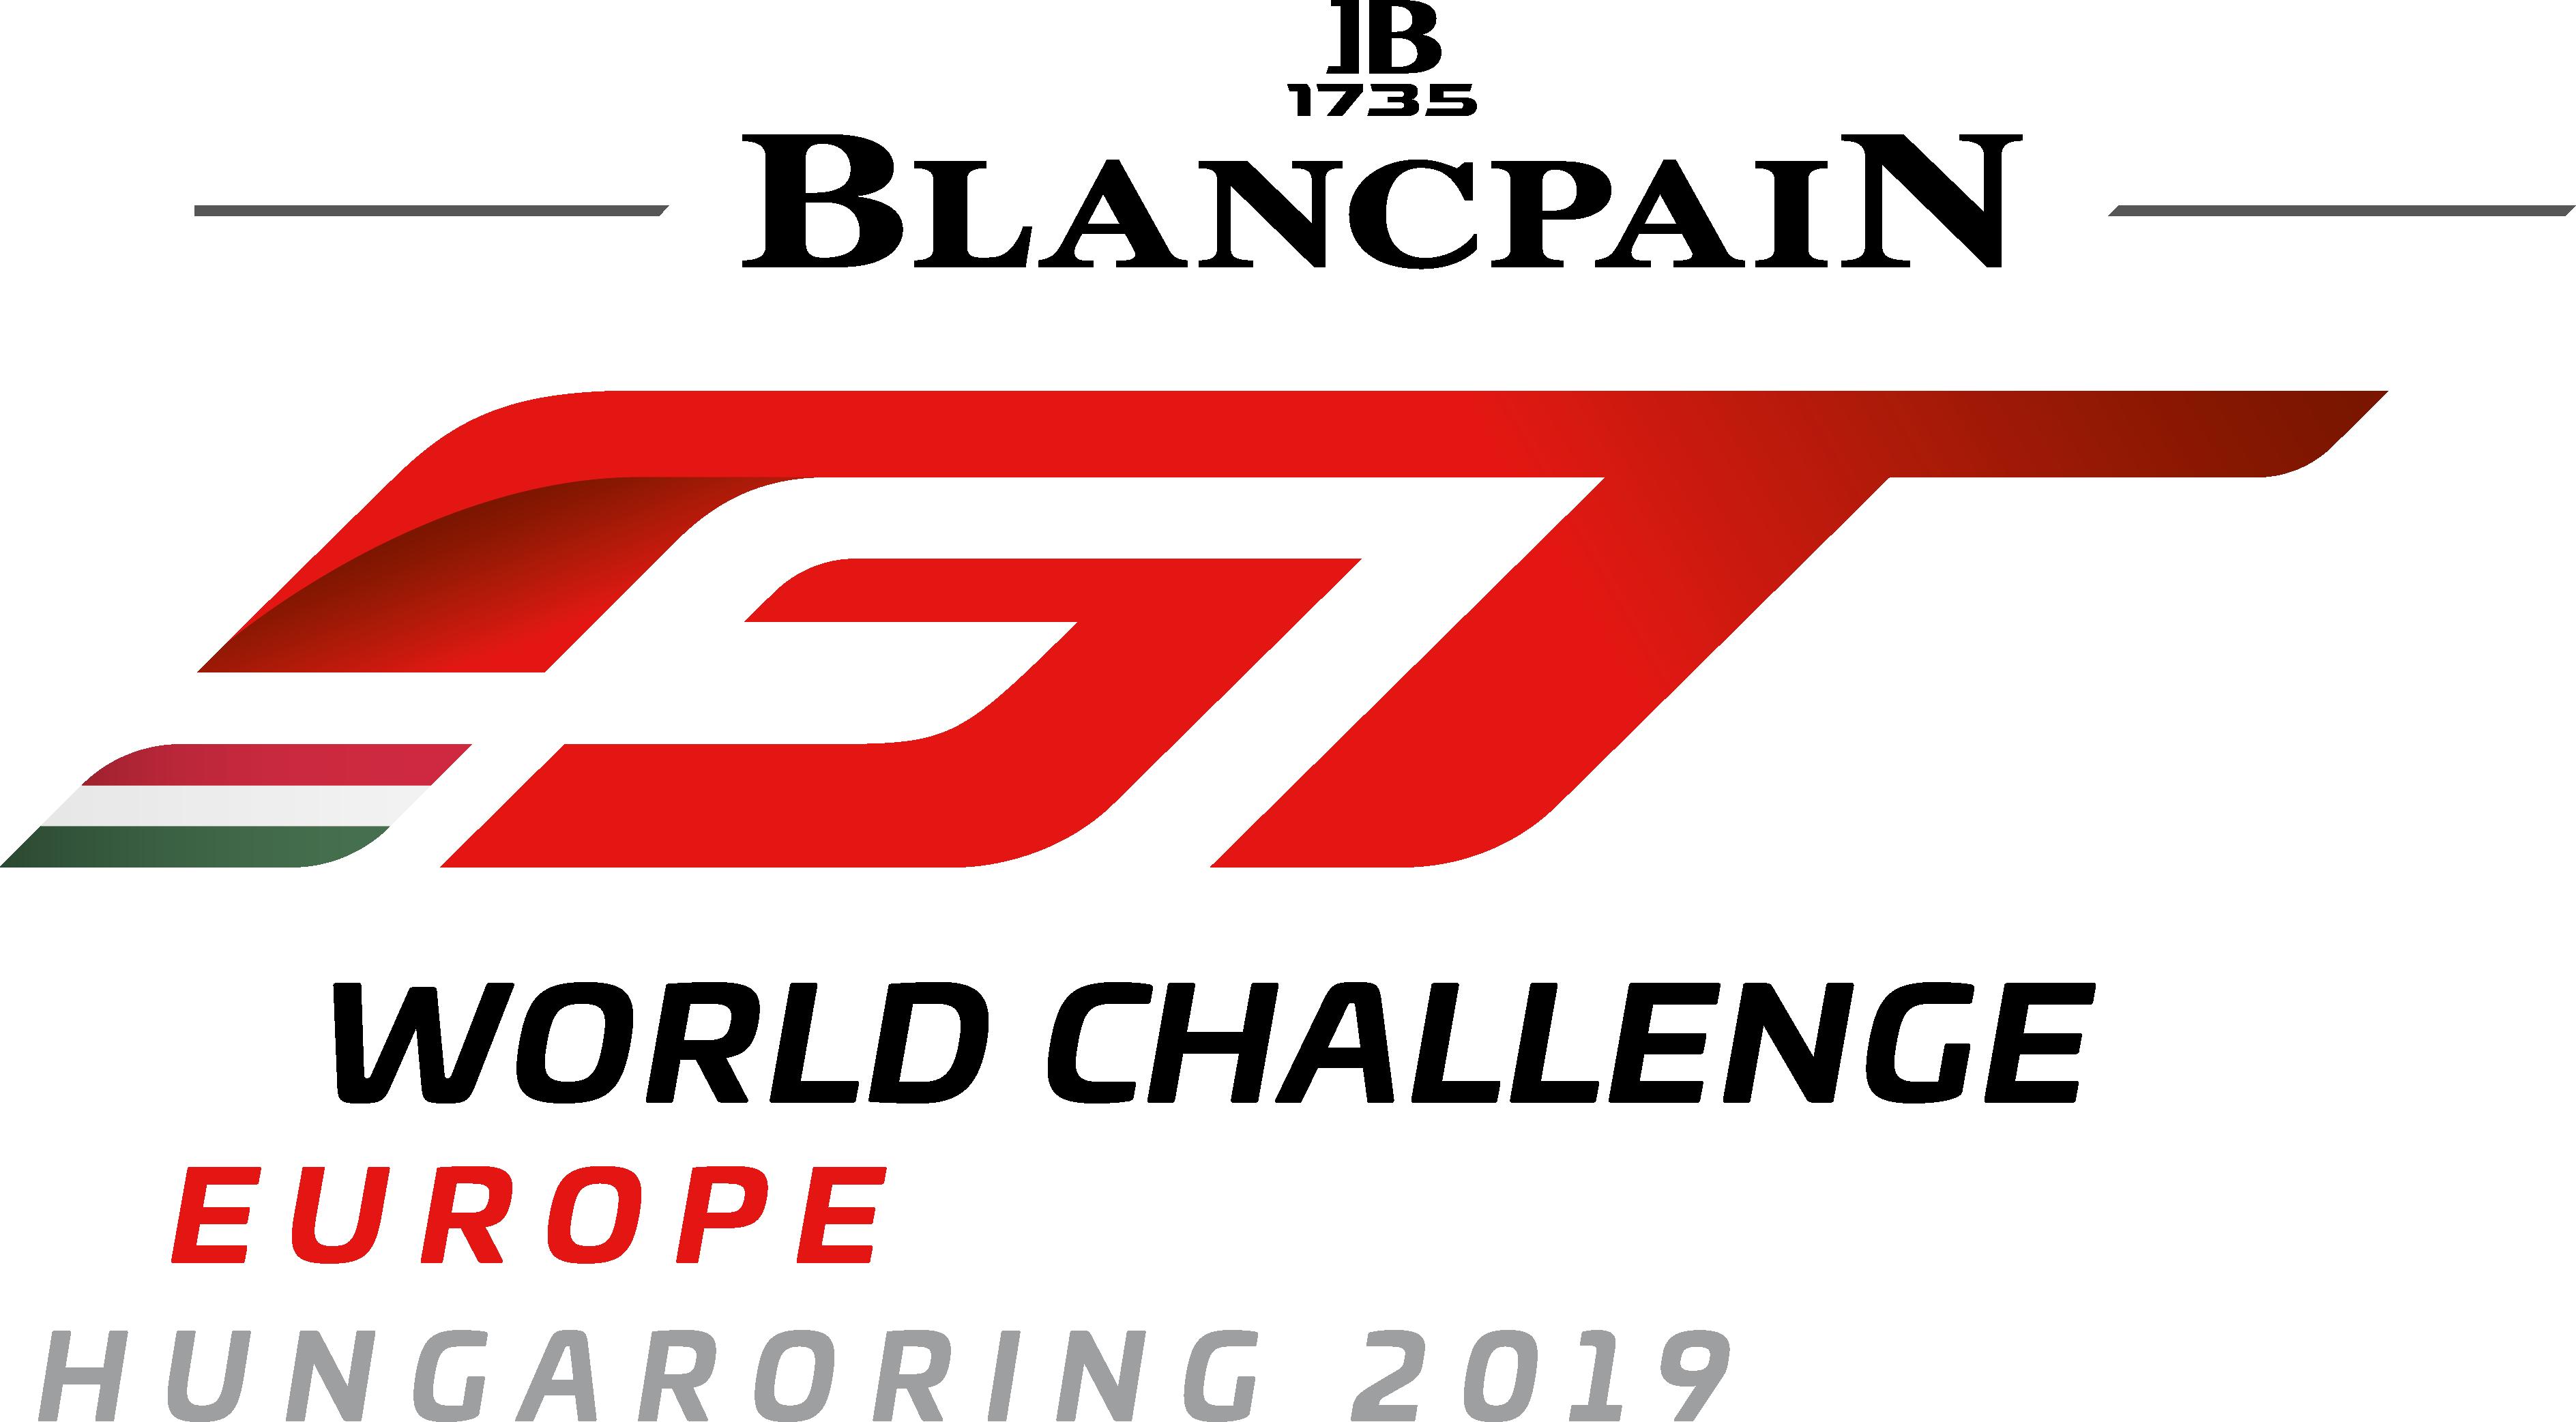 Blancpain GT World Challenge Europe - BUDAPEST